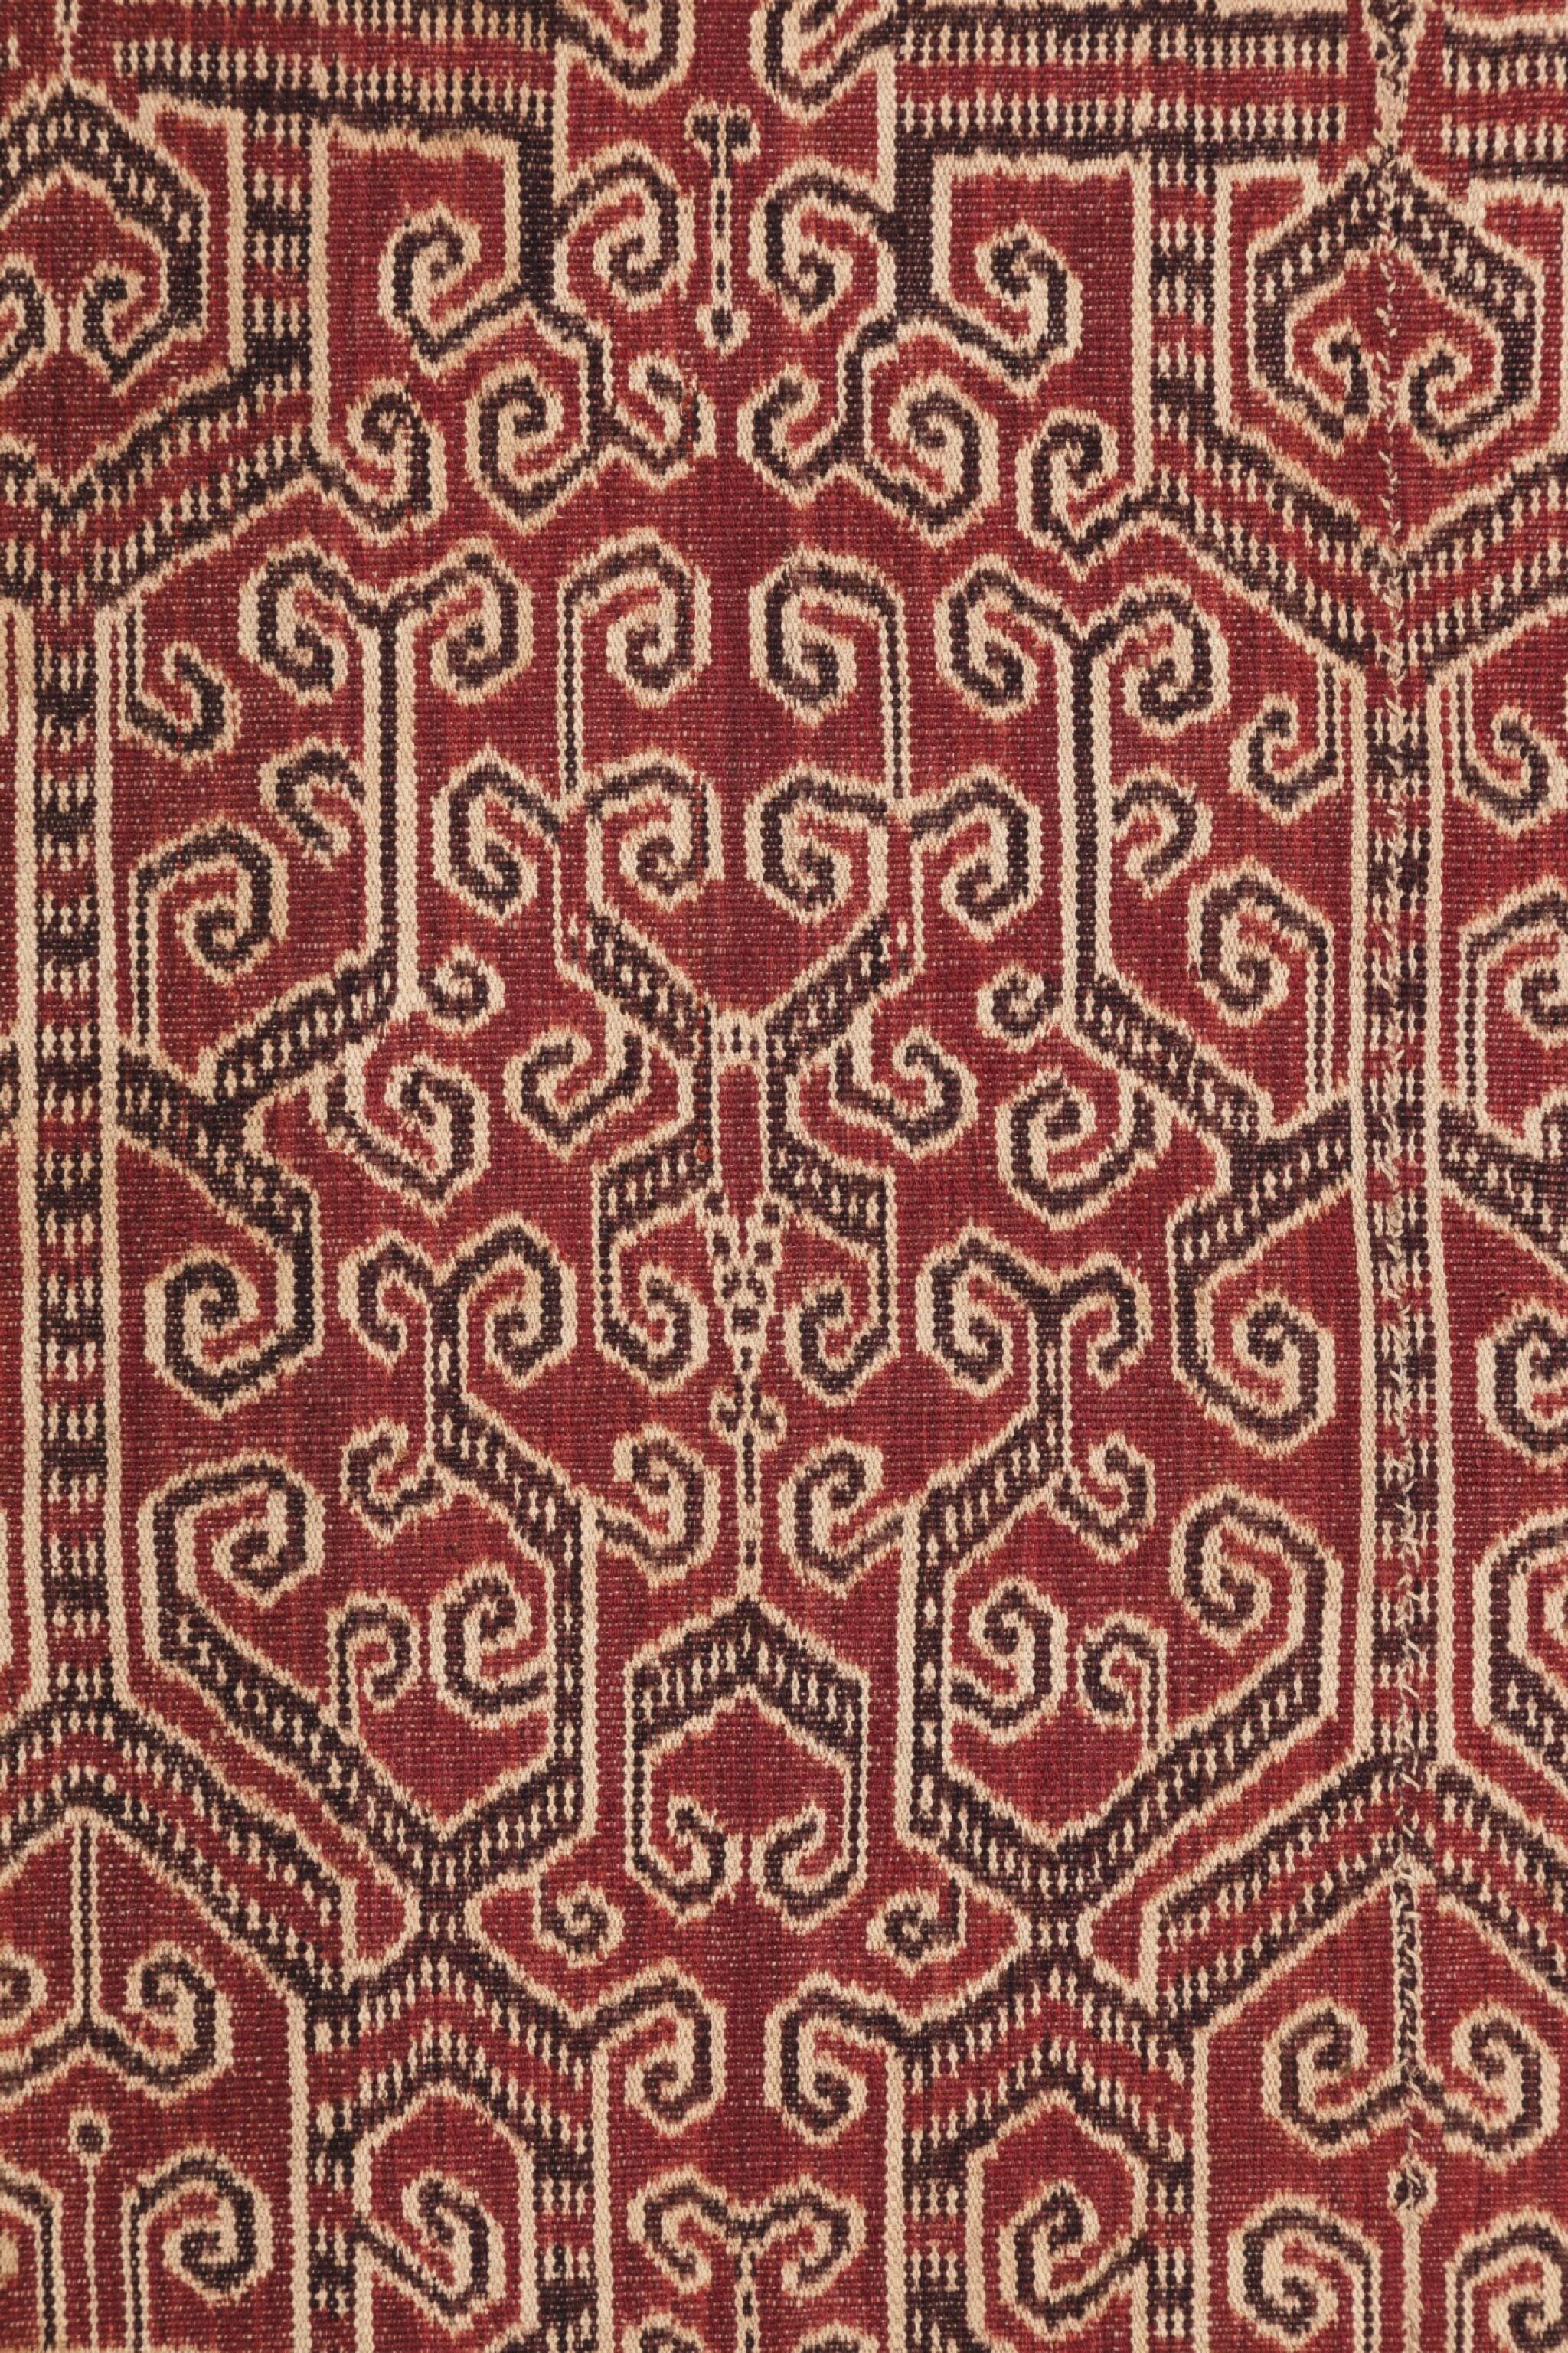 View full screen - View 1 of Lot 2. Tissu cérémoniel pua, Iban, Bornéo, Indonésie, début du 20e siècle | Ceremonial cloth pua, Iban, Borneo, Indonesia, early 20th century.